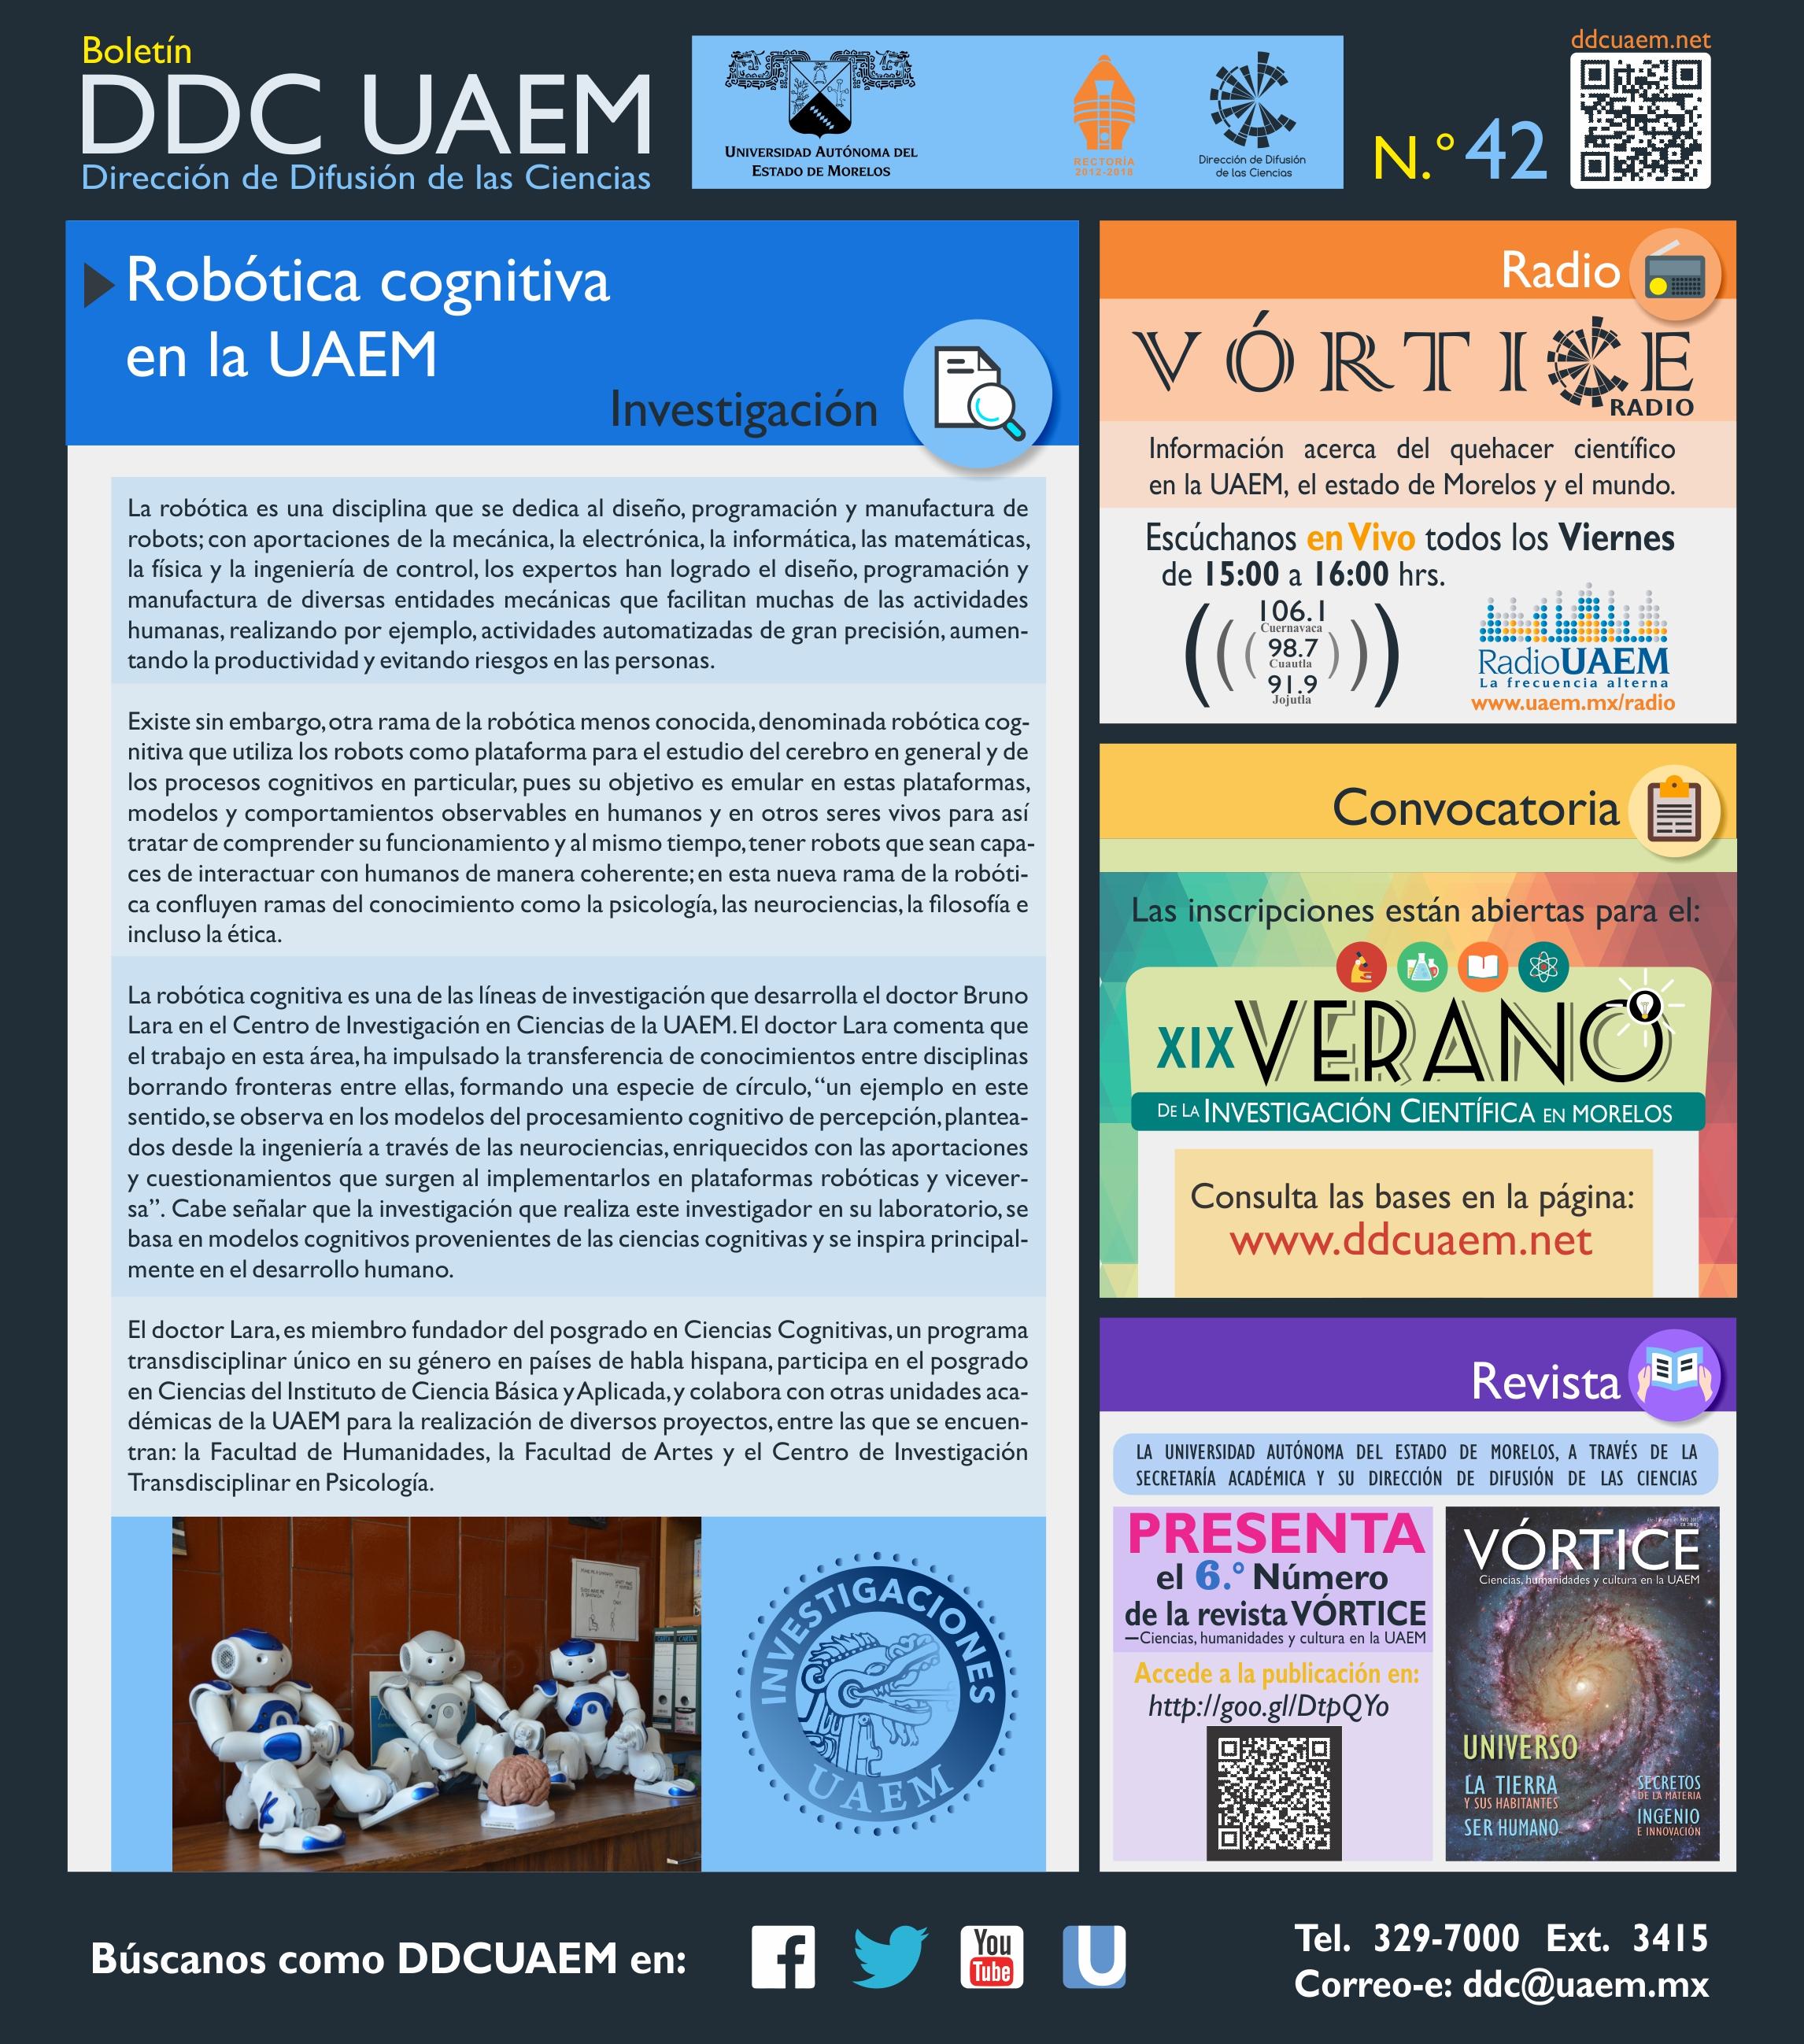 Boletín DDC 42 - RS